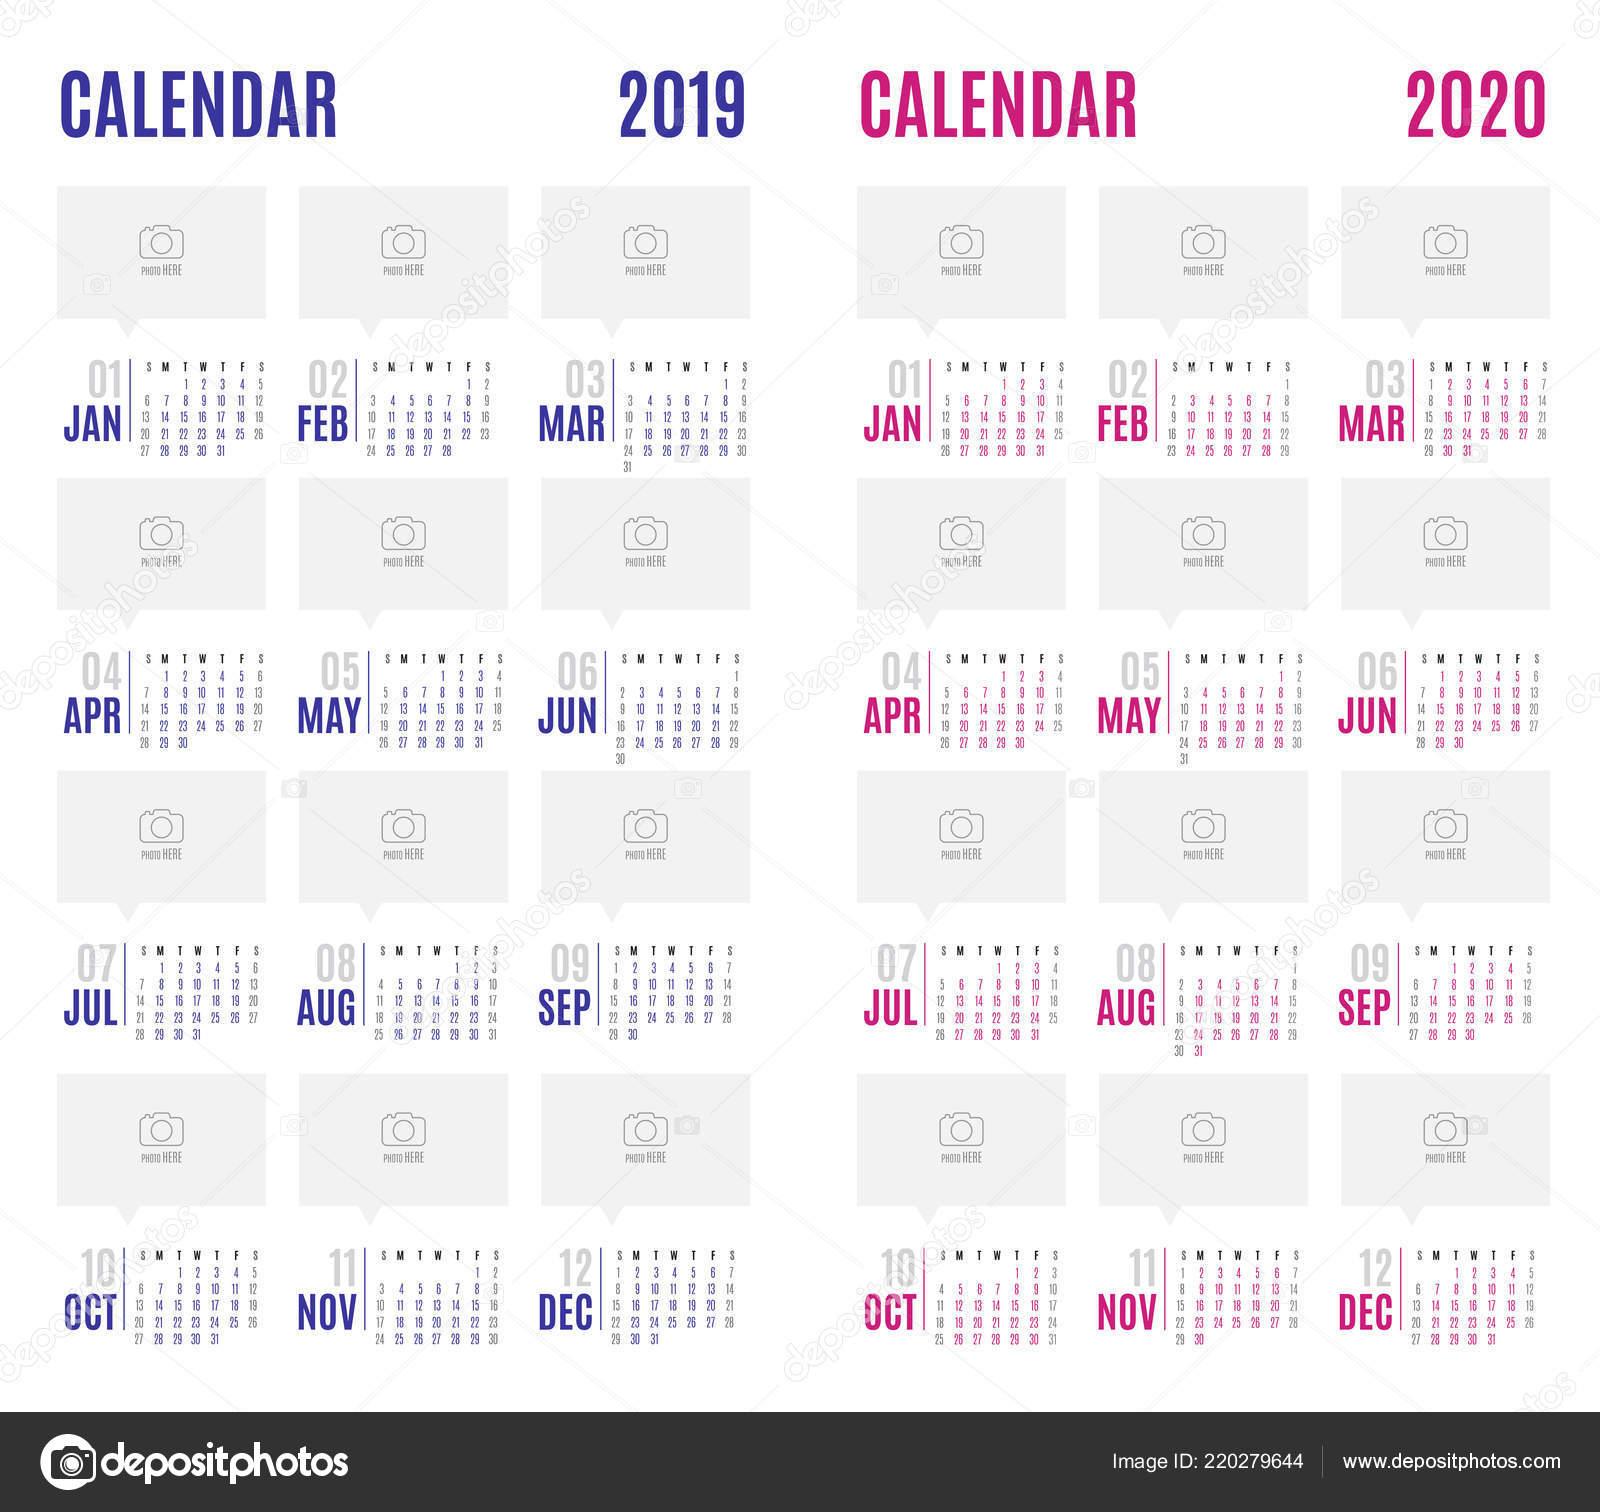 Calendario 2020 Planner.Vector Calendar Blue 2019 Pink 2020 New Year Modern Simple